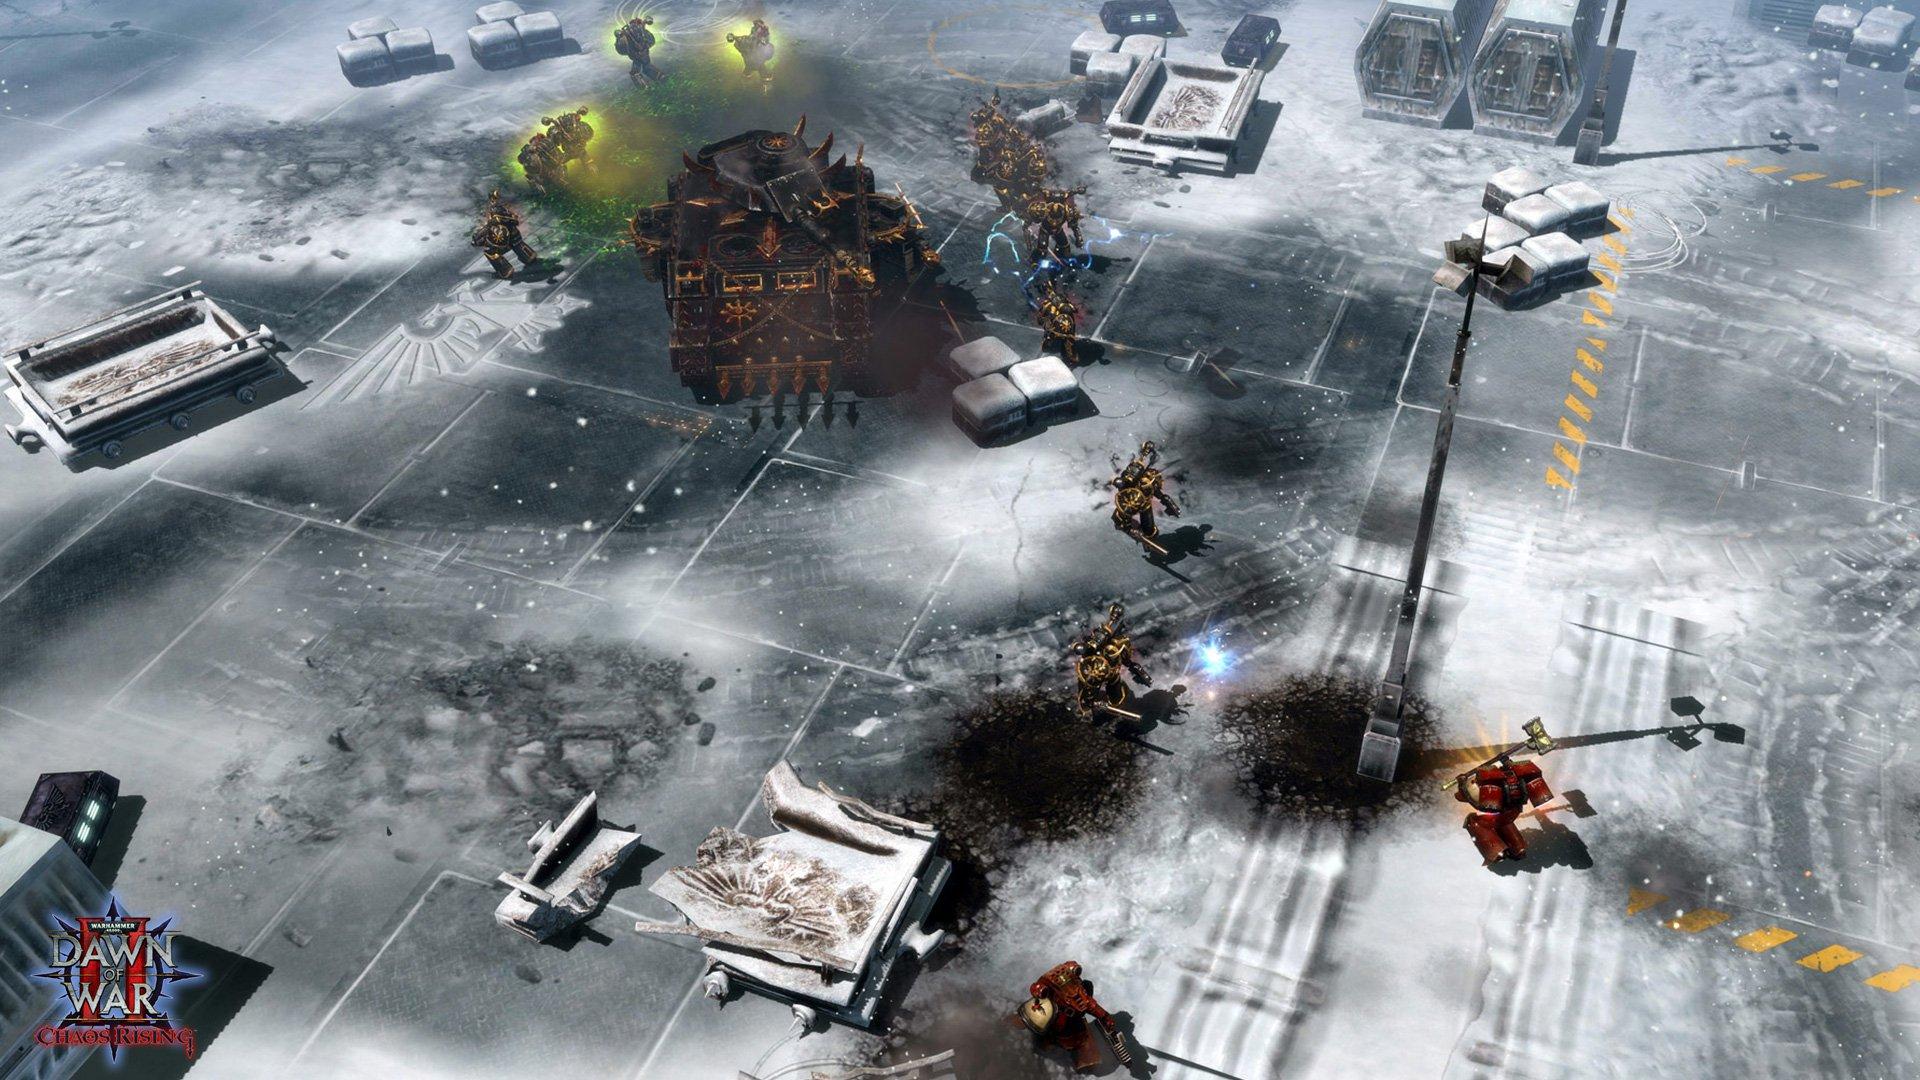 Warhammer 40,000 Dawn of War II Chaos Rising 7